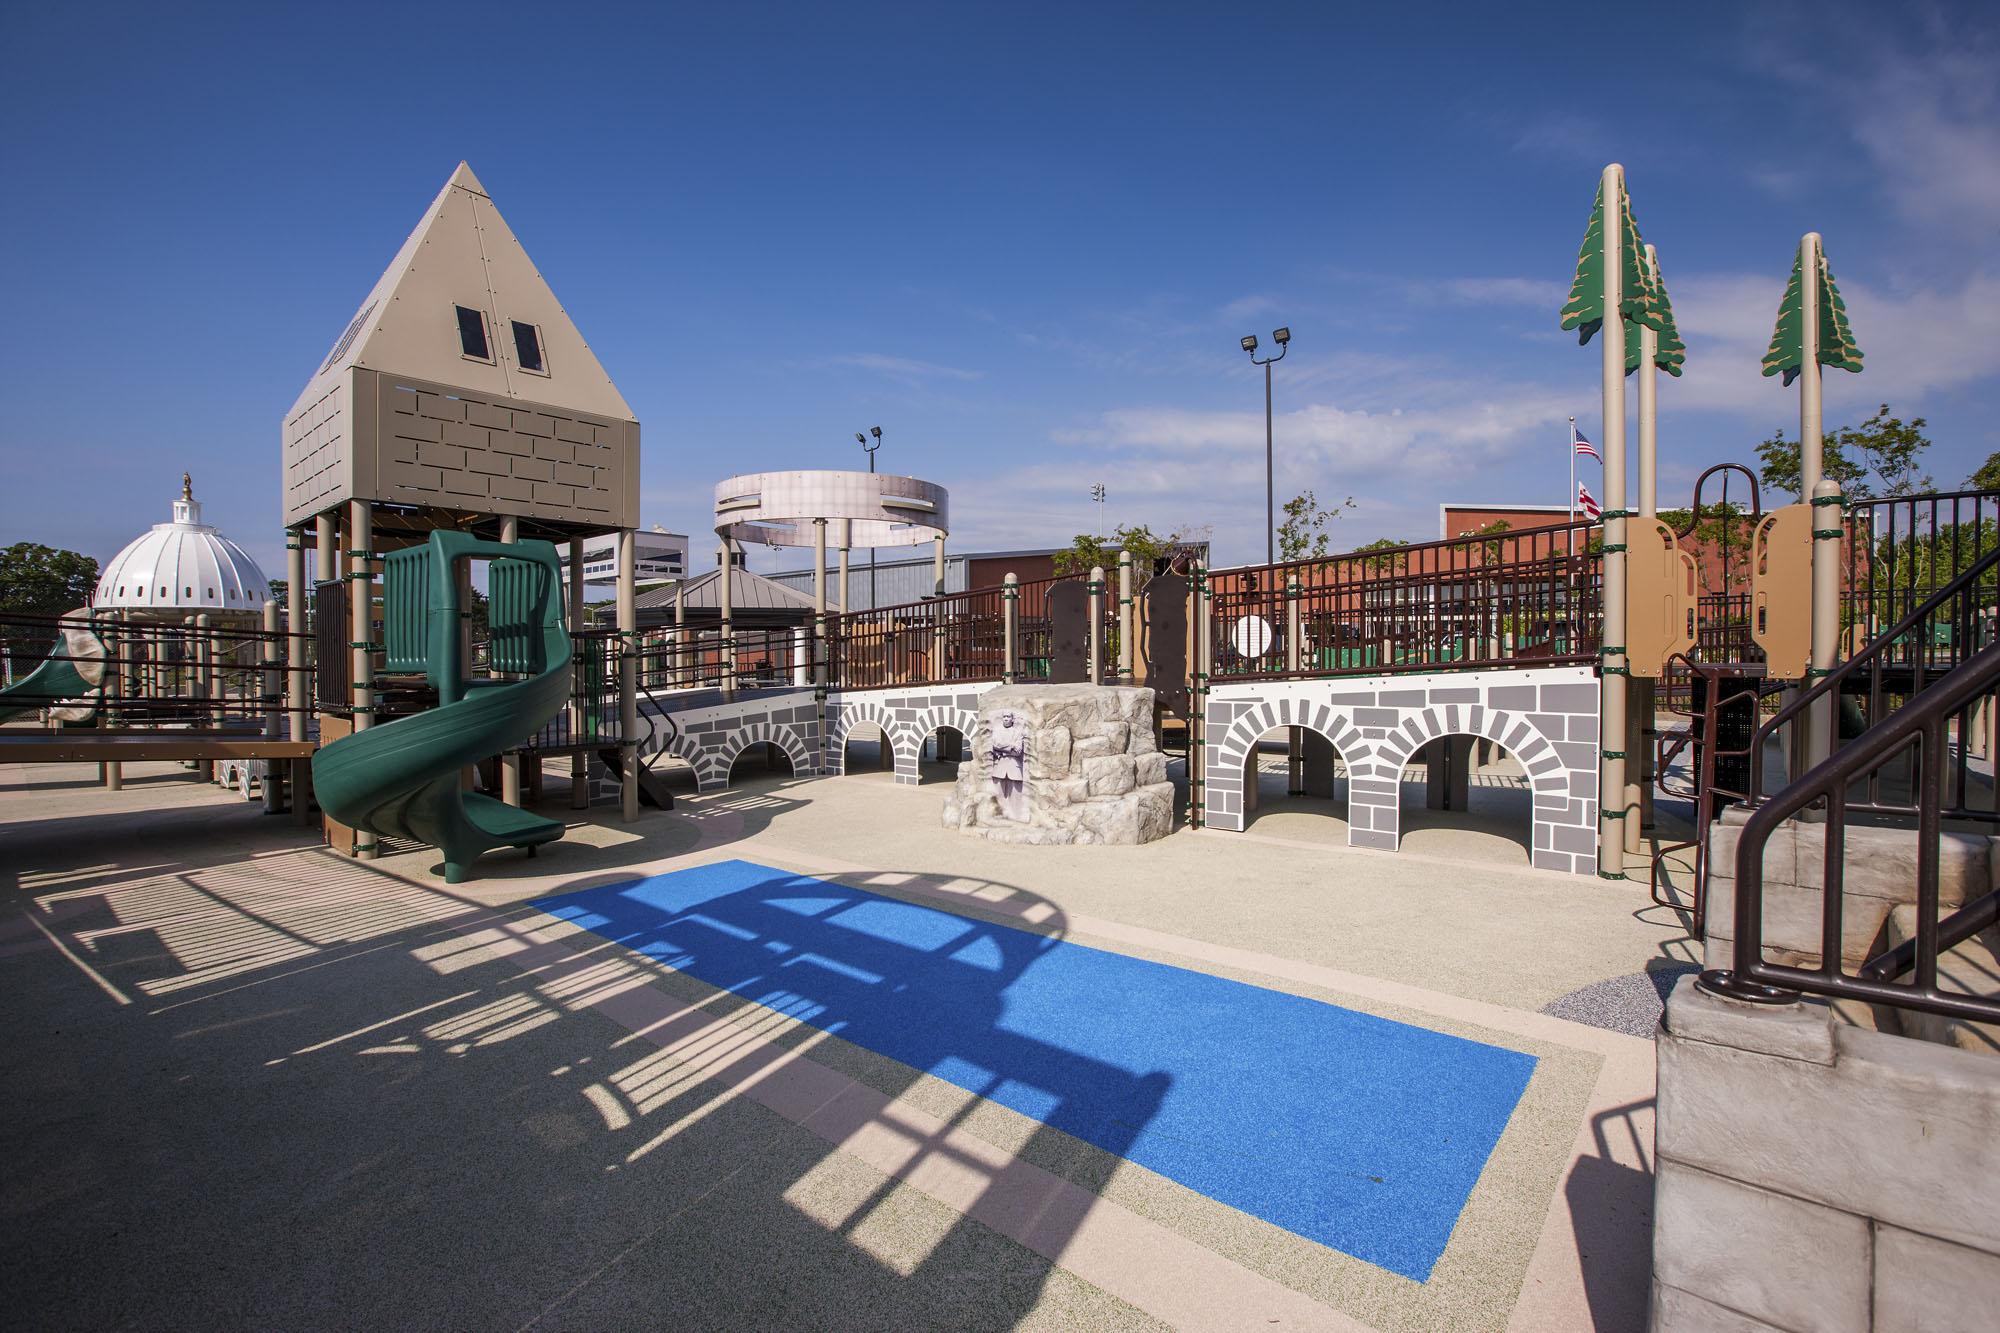 Rosedale Rec Center Exterior Image-146735.jpg